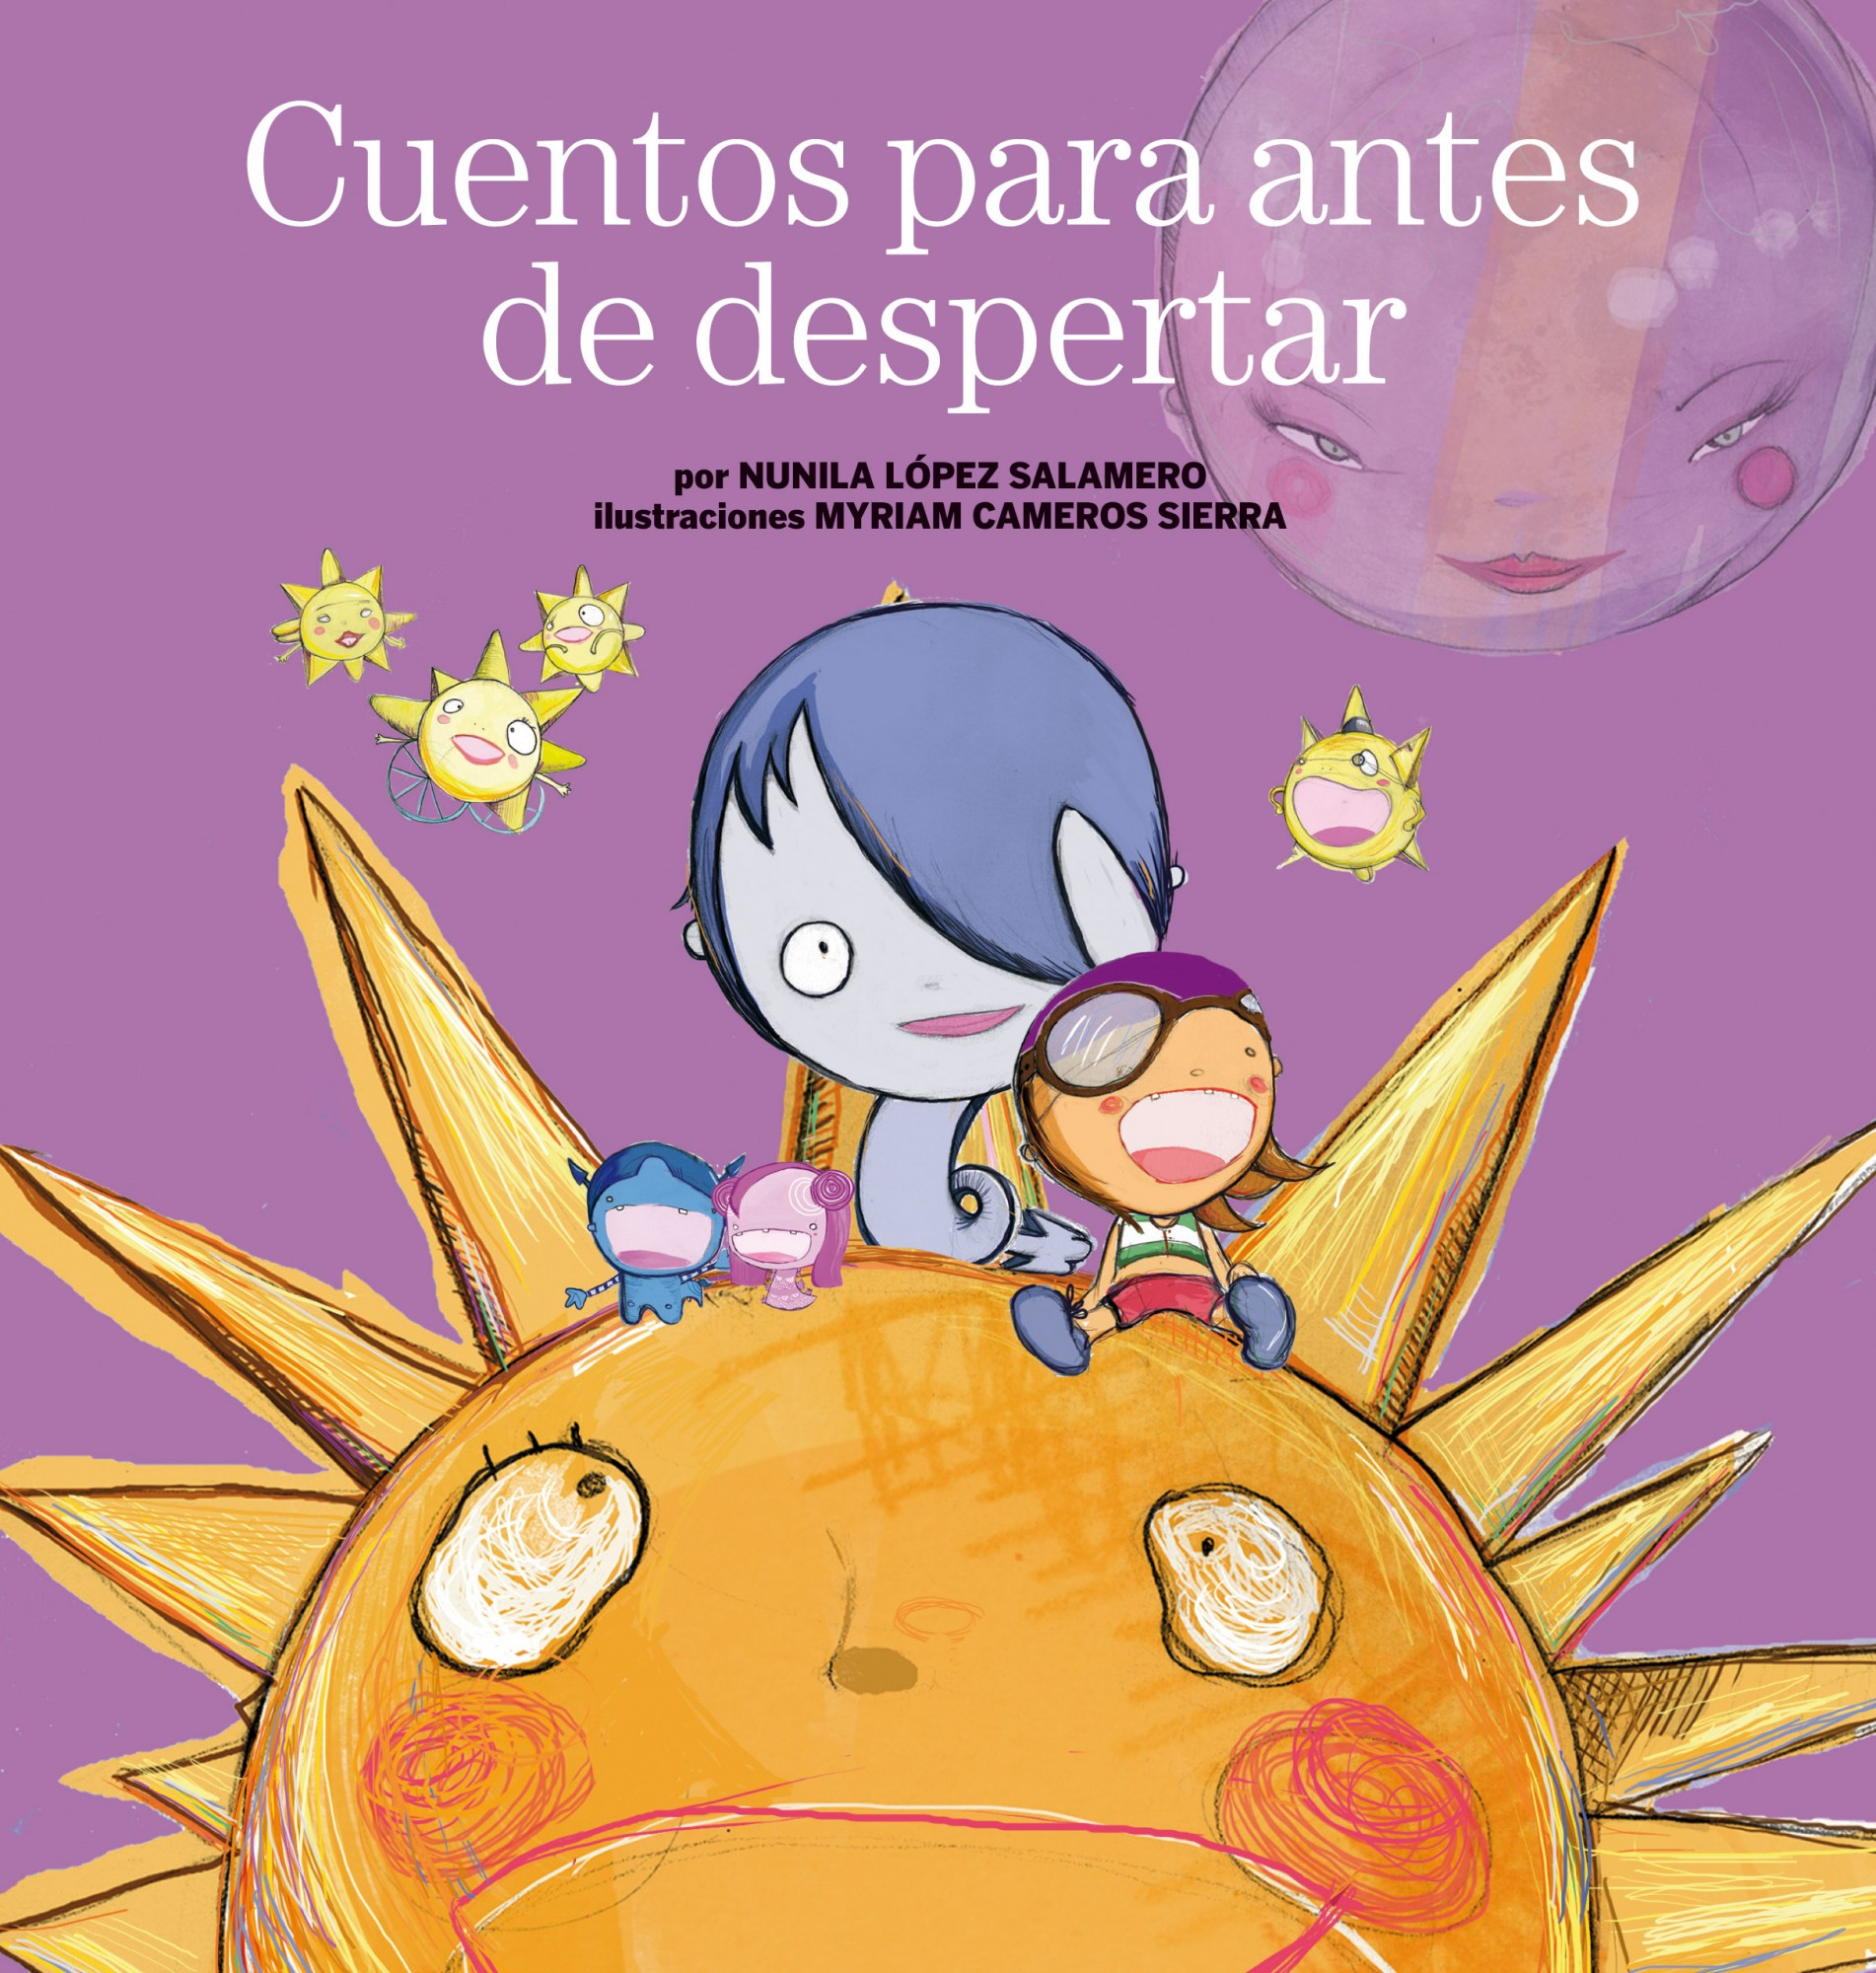 121 Bonitas Frases de Libros Famosos - lifedercom